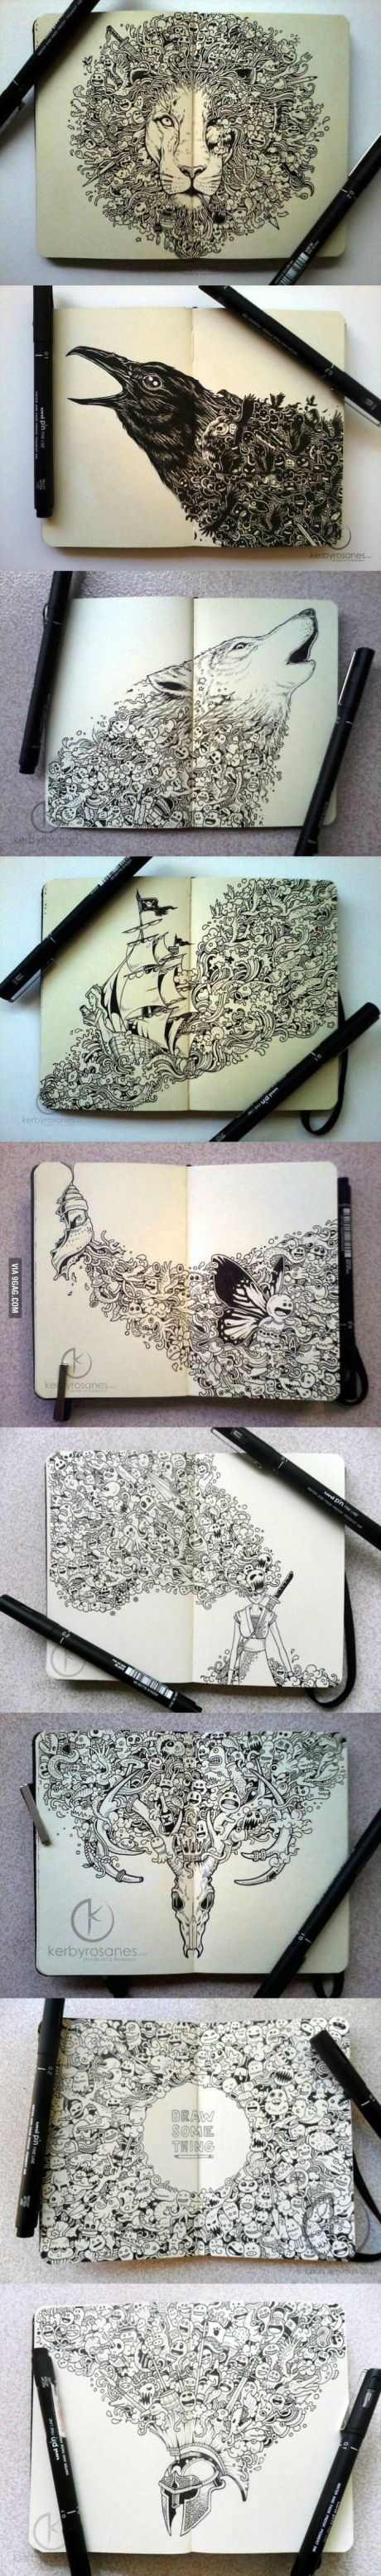 The best images about desenhos on Pinterest